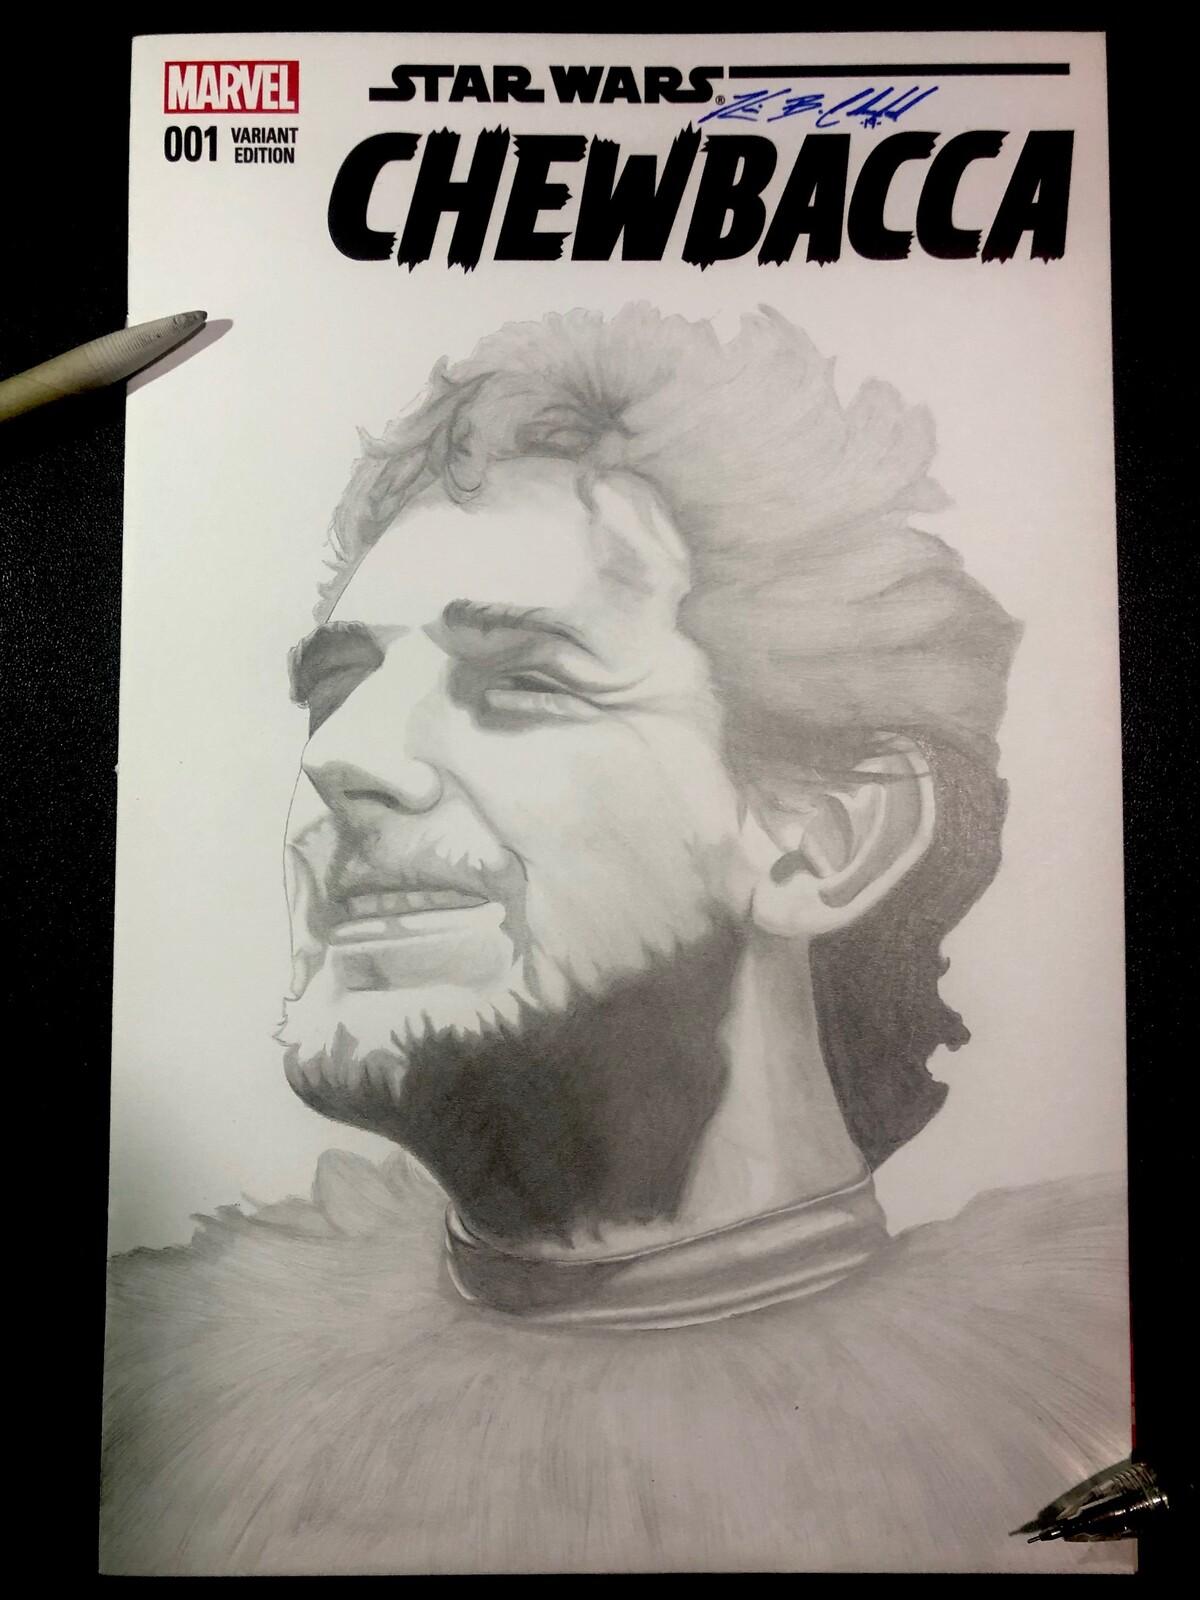 Comic cover art tribute to Peter Mayhew